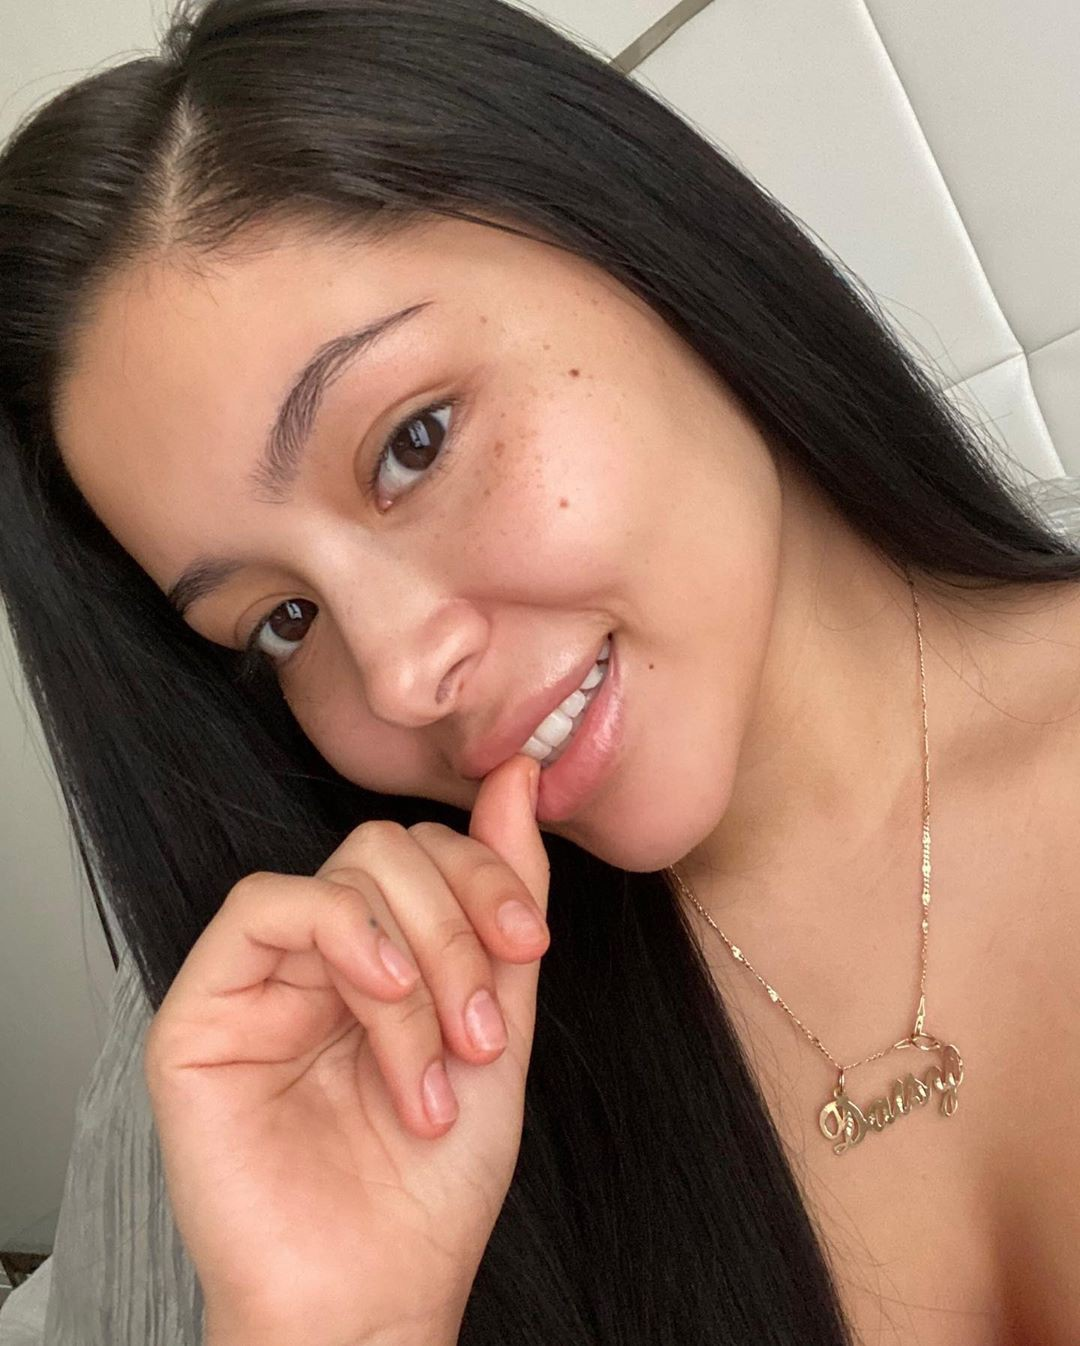 Daisy Marquez Black Hair Color Ideas, Girls With Cute Face, Lips Smile